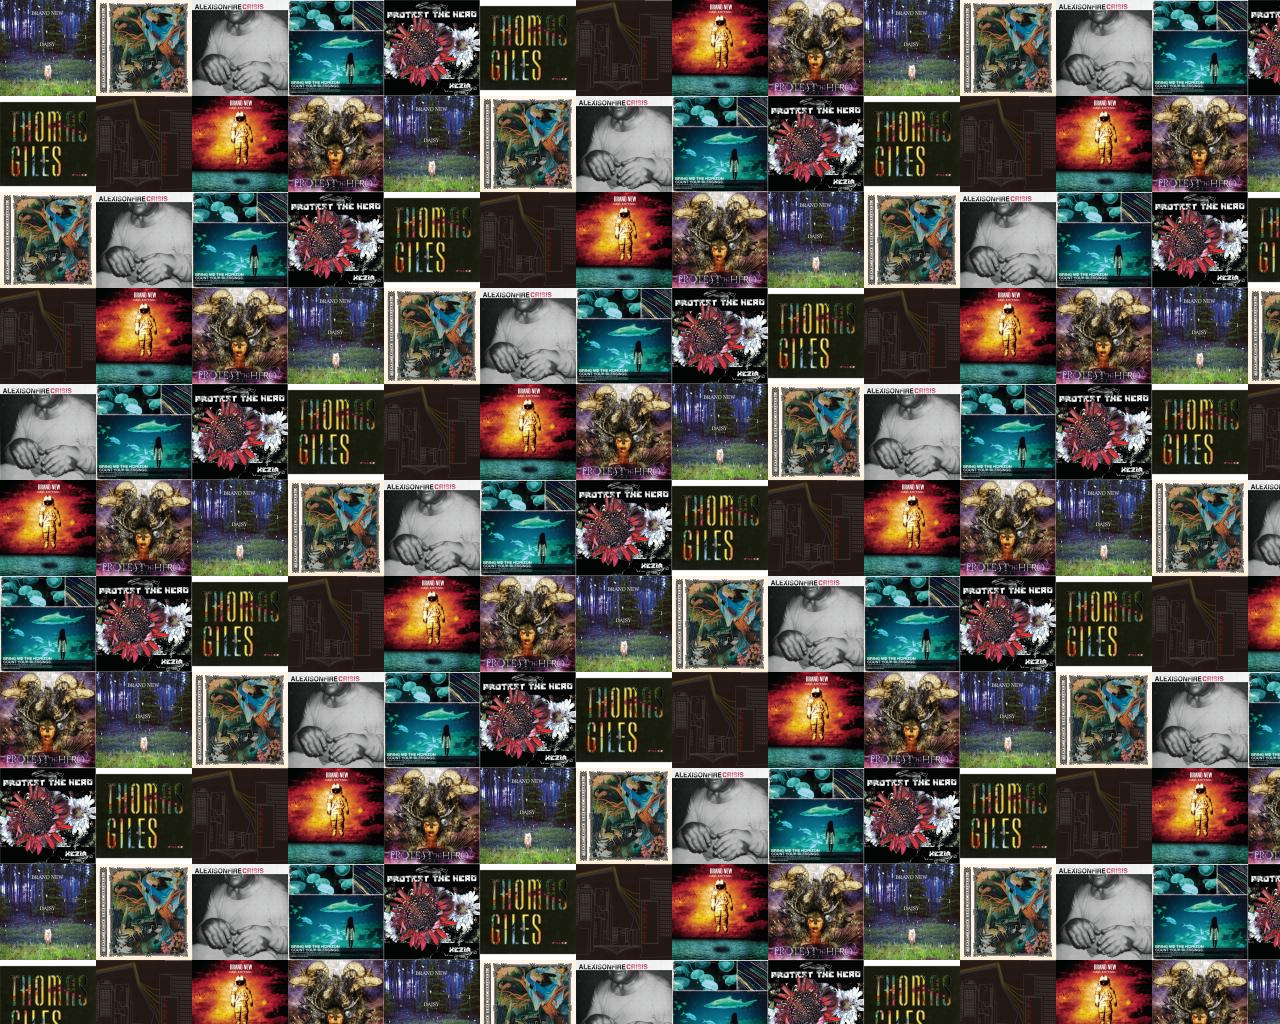 Brand New Daisy Protest Hero Scurrilous Alexisonfire Crisis Wallpaper 1280x1024